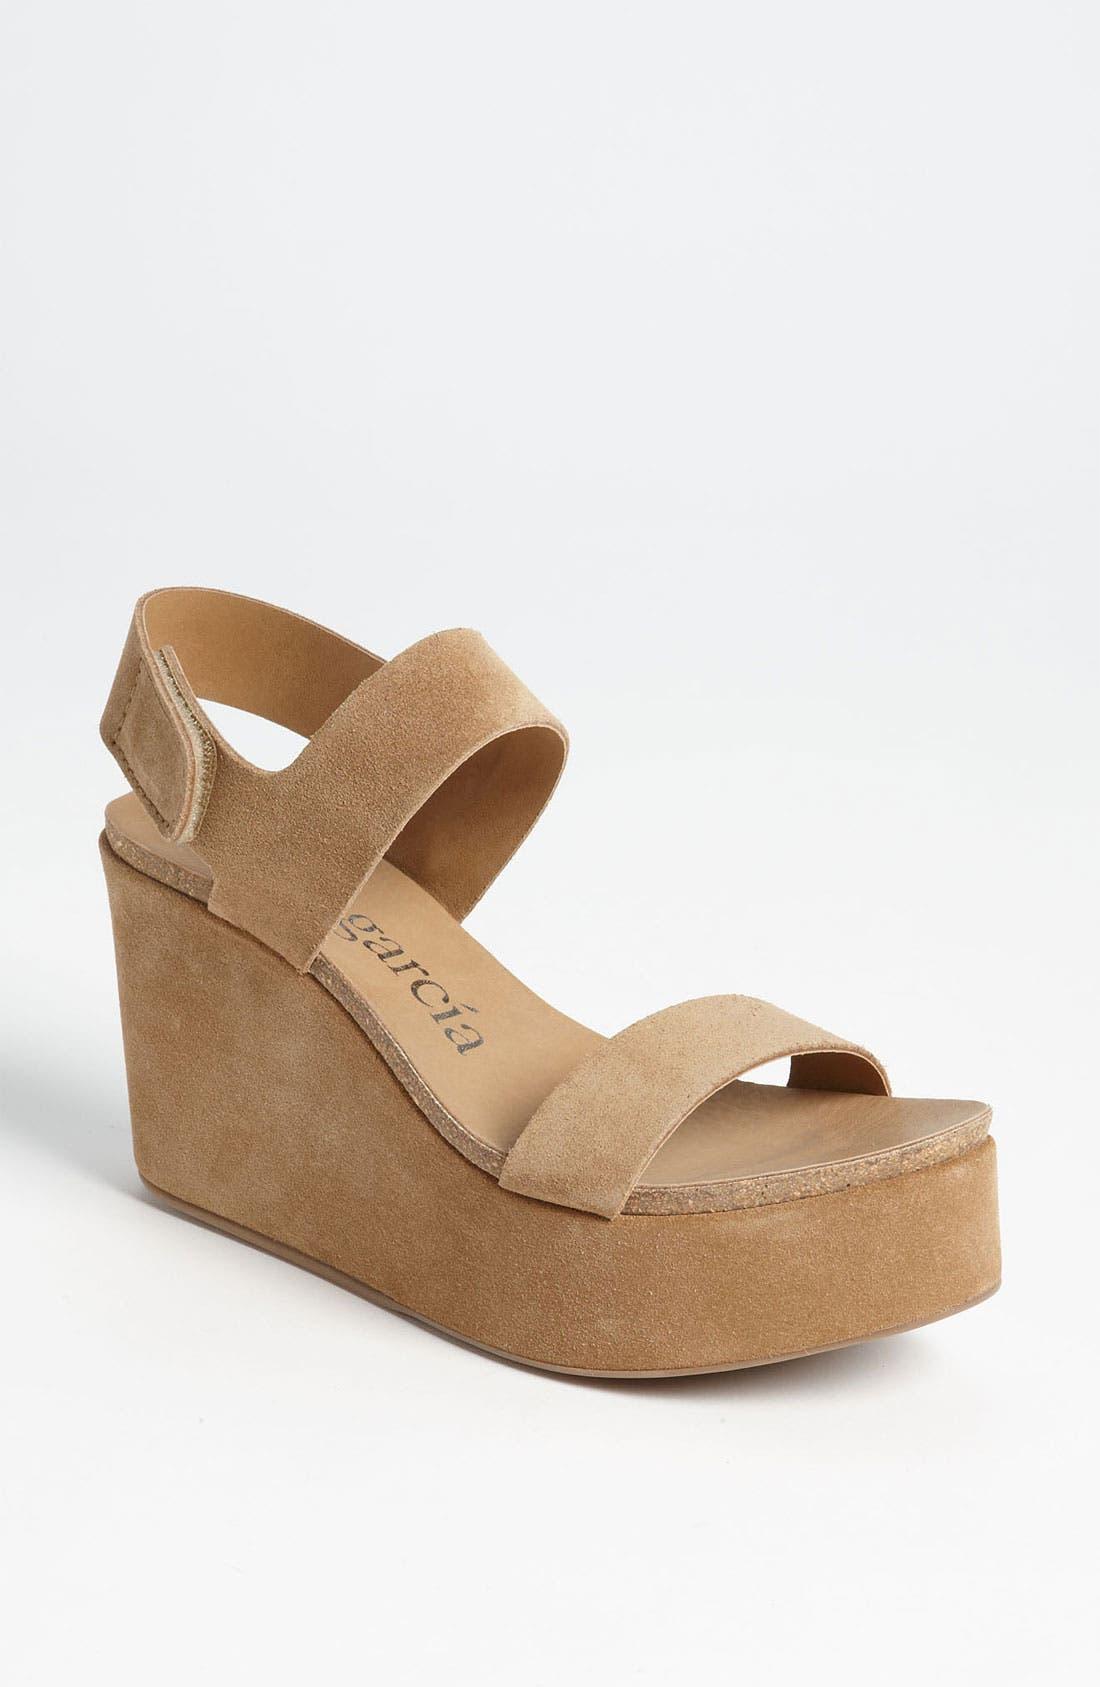 Main Image - Pedro Garcia 'Dakota' Wedge Sandal (Exclusive Color)